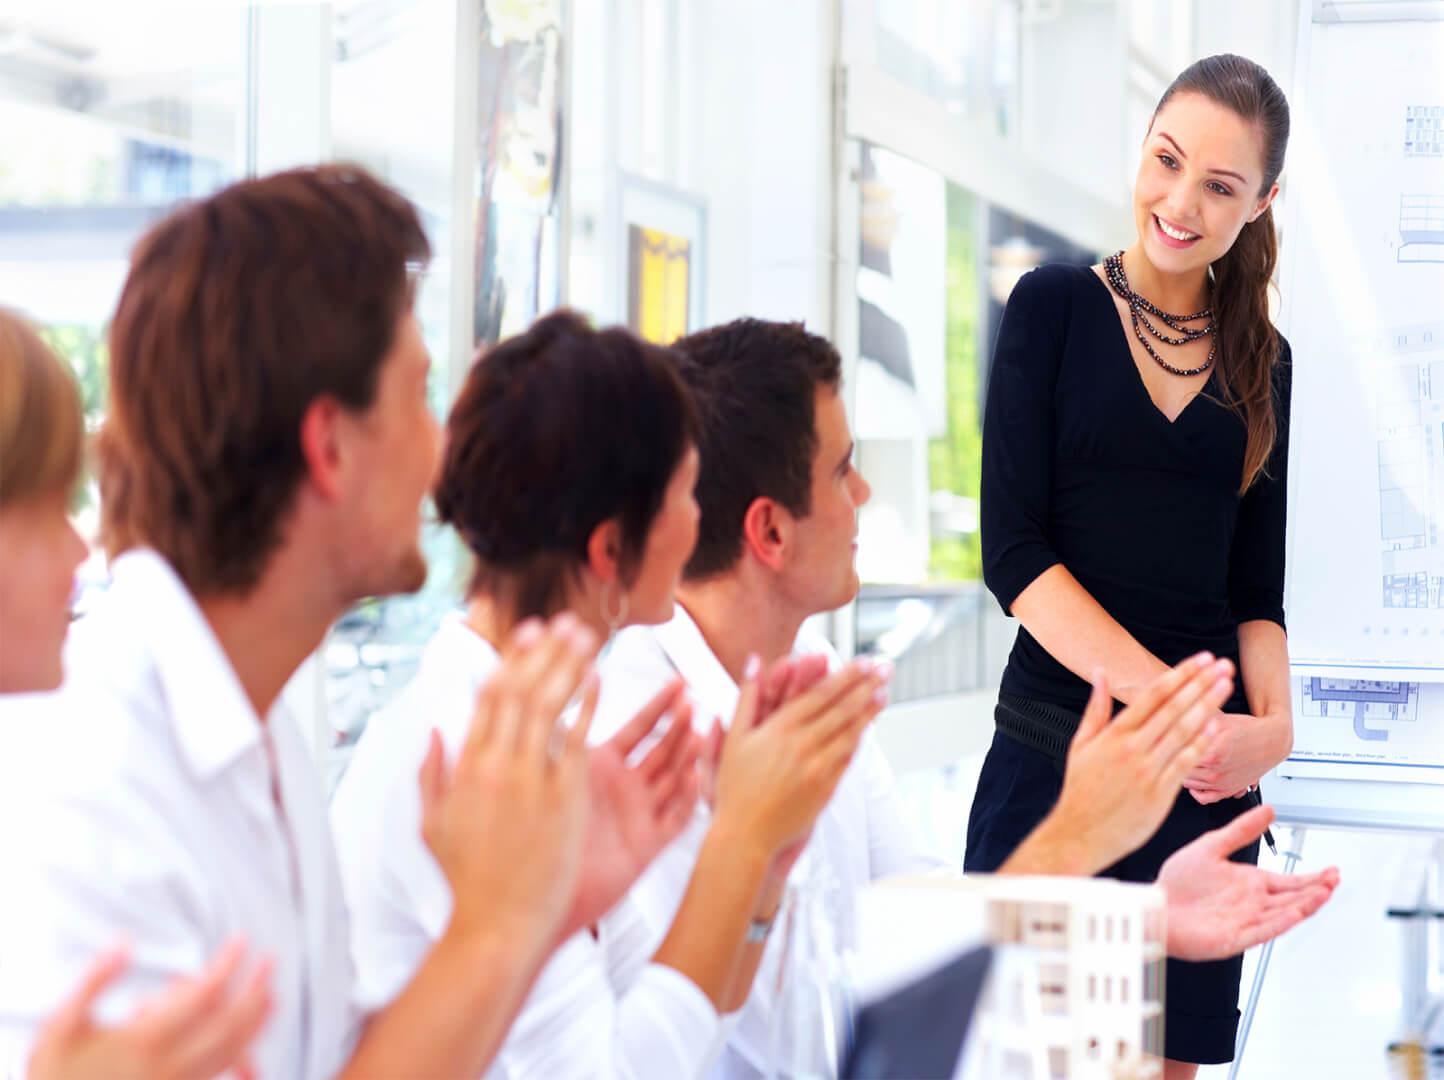 тренинг ораторские навыки